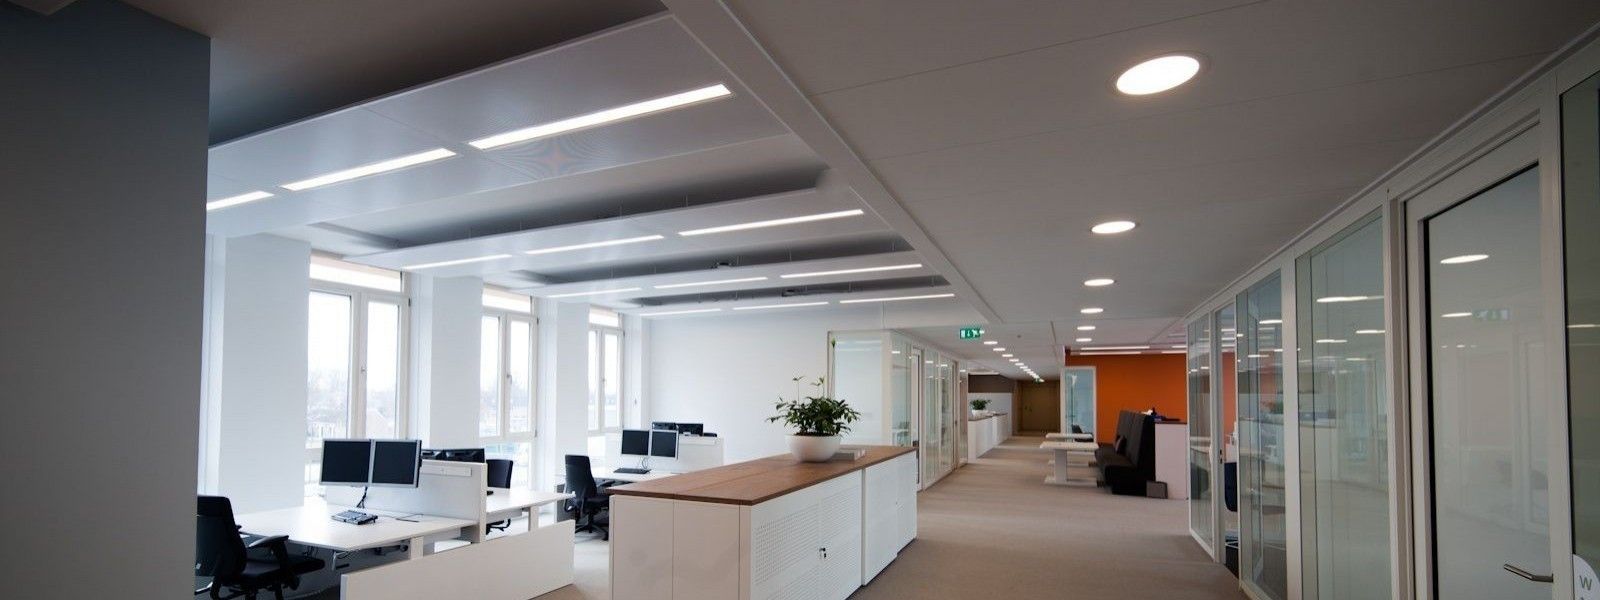 Kantoorverlichting | QL Company